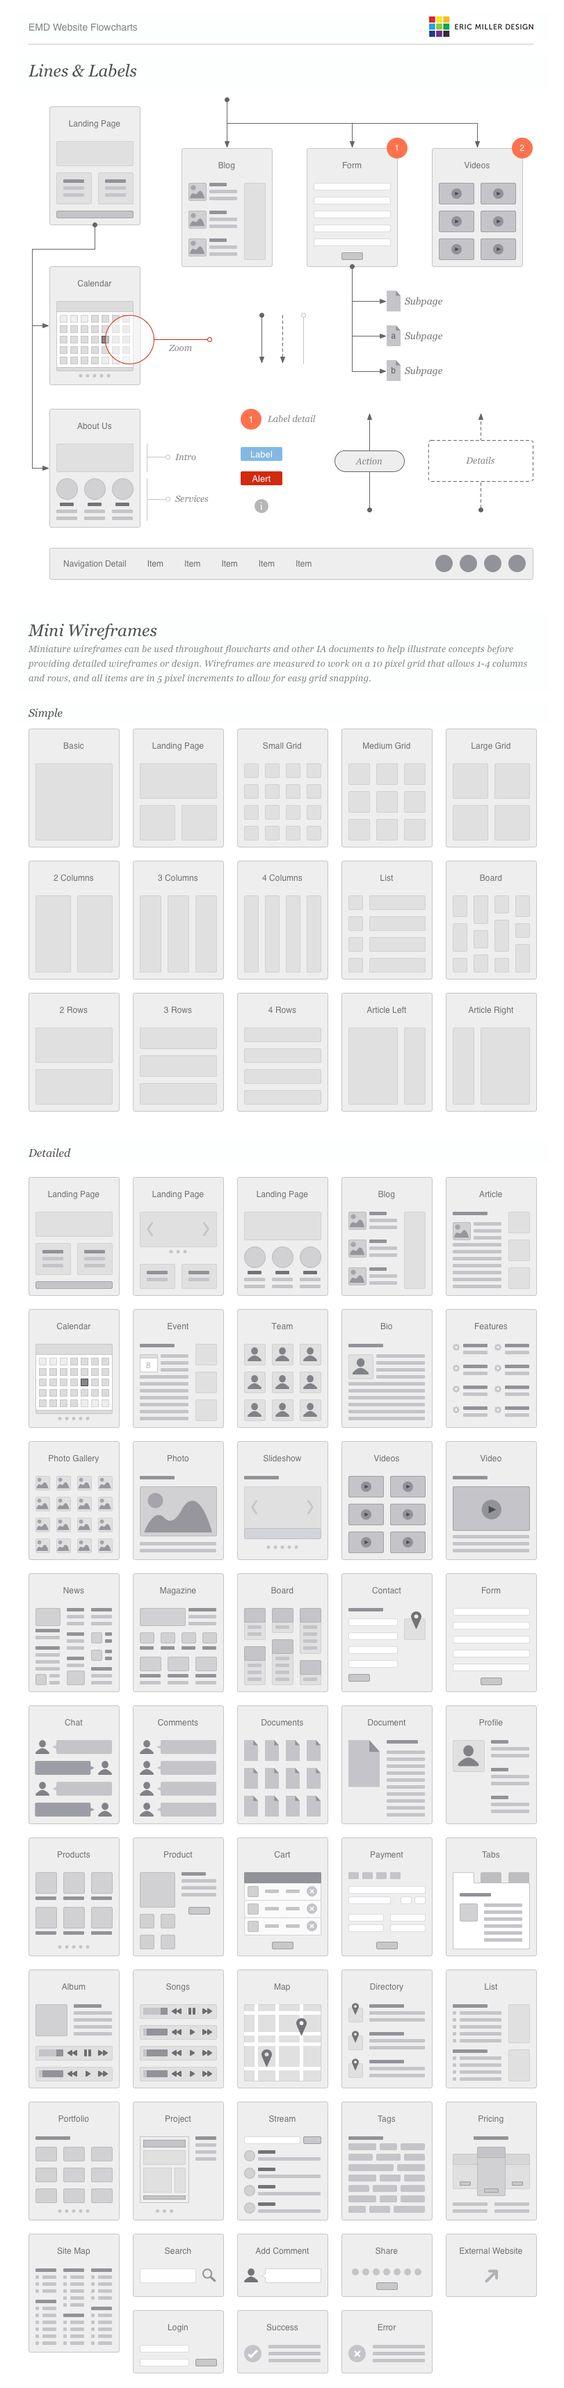 website flowcharts and site maps ai pinterest design graphics and apps. Black Bedroom Furniture Sets. Home Design Ideas